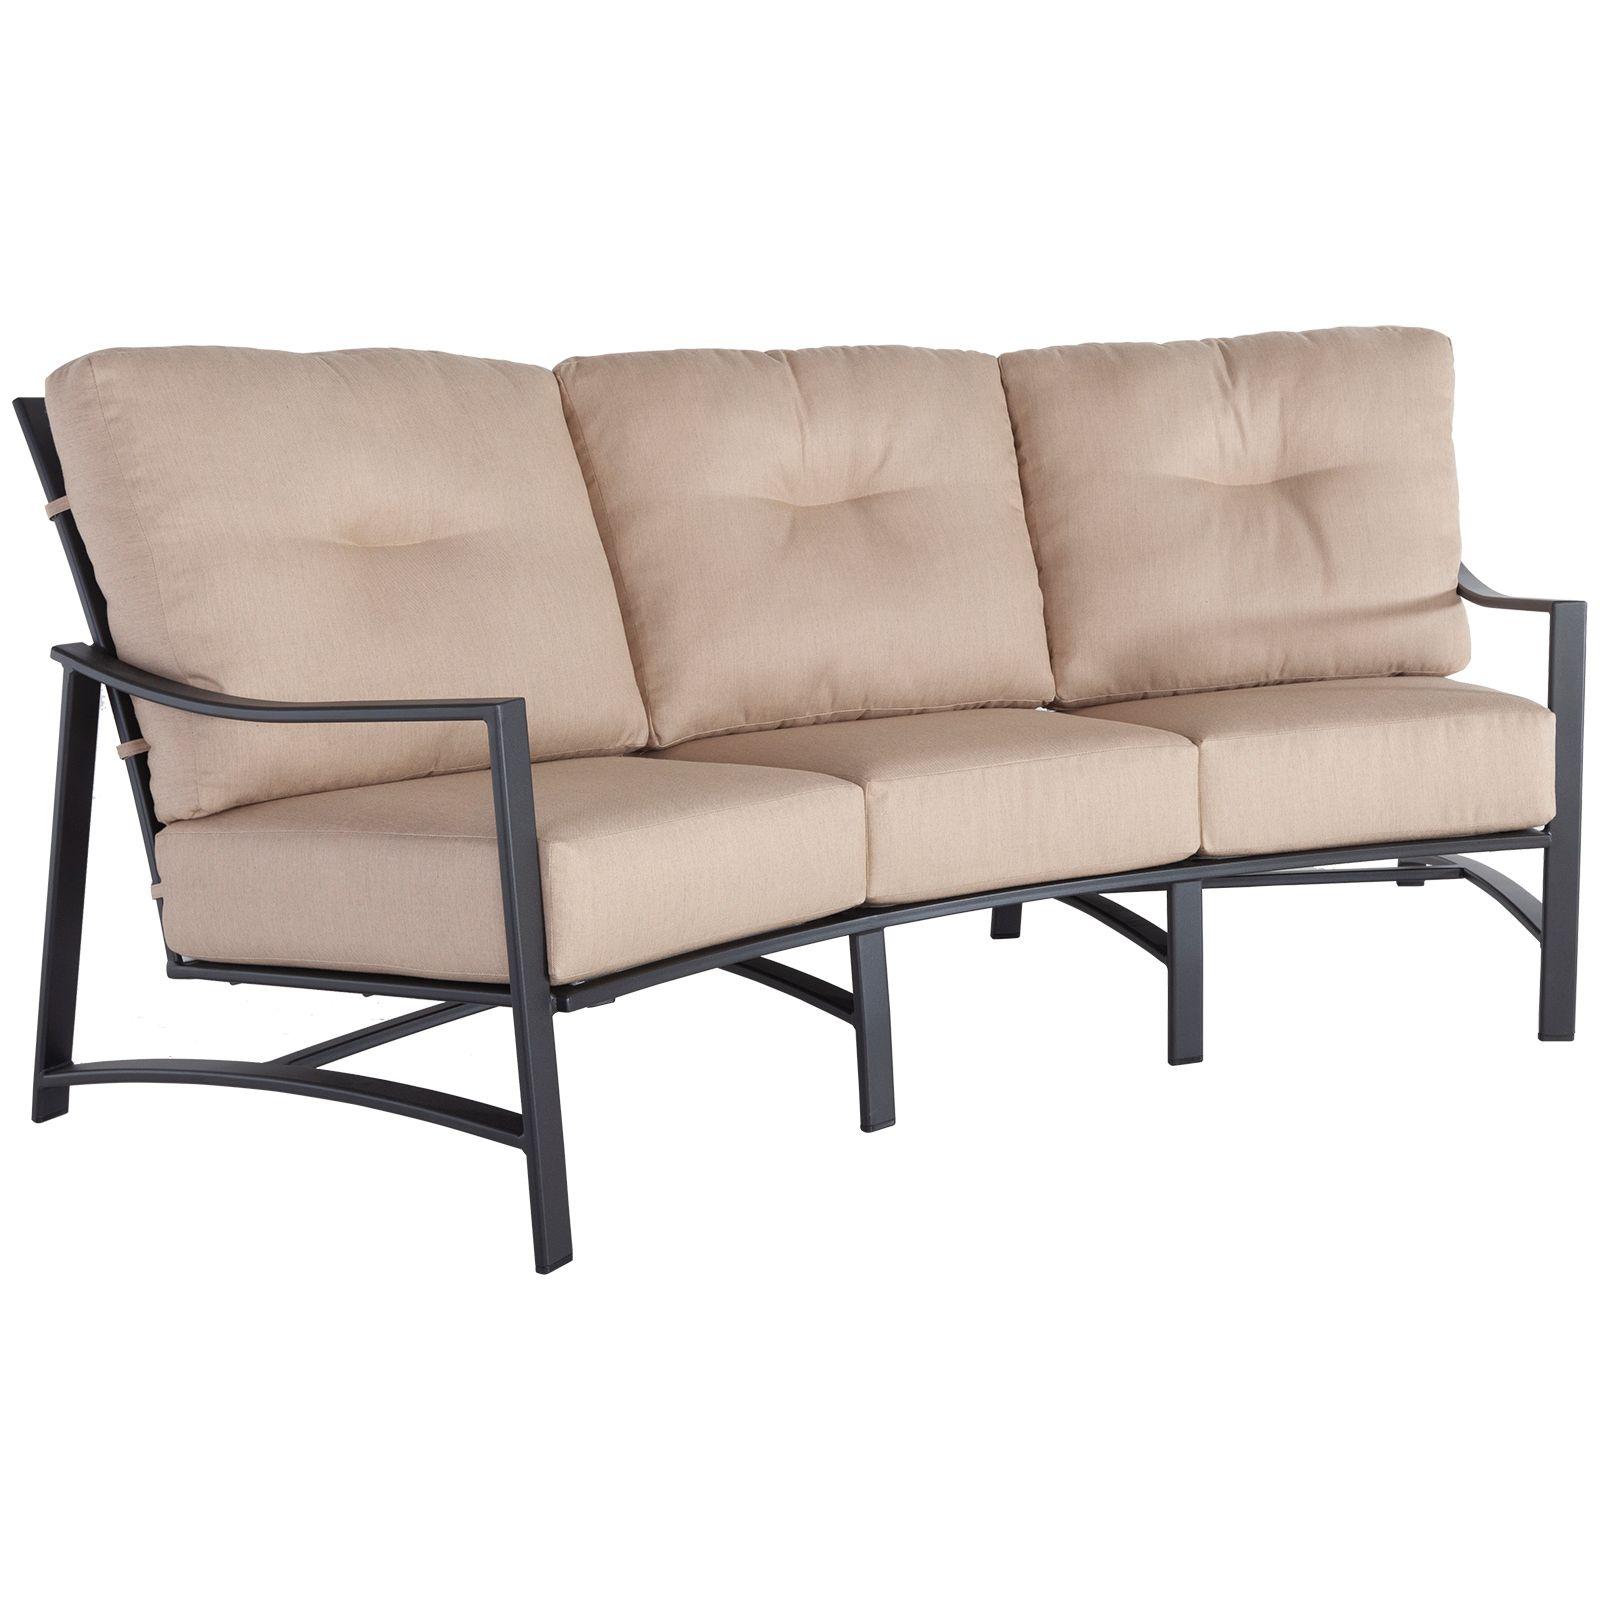 Avana Crescent Sofa